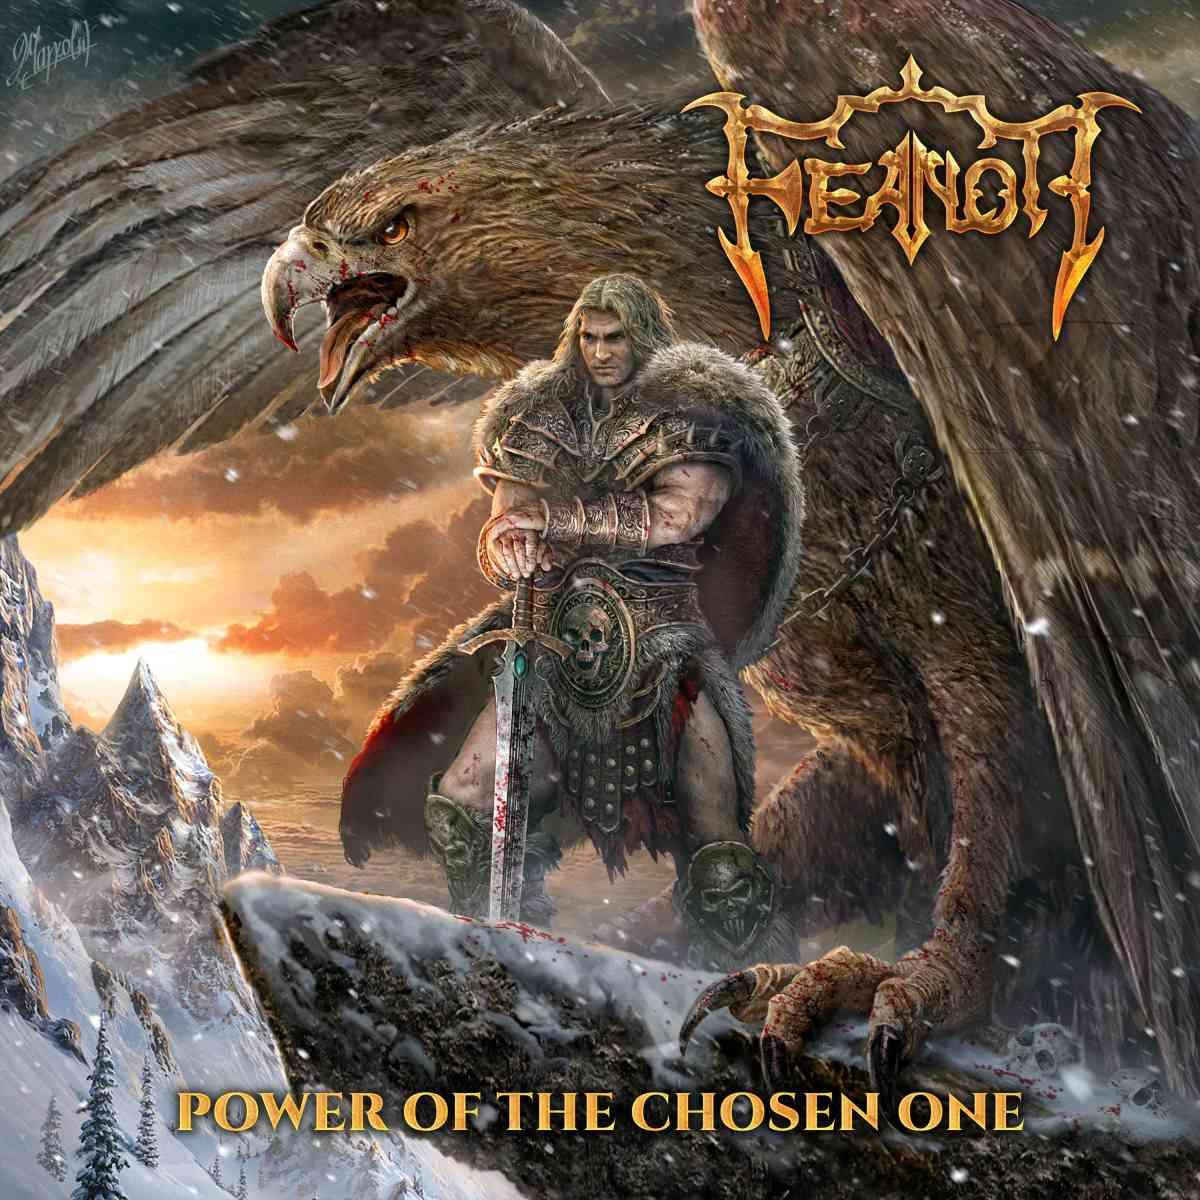 feanor - power of the chosen one - album cover